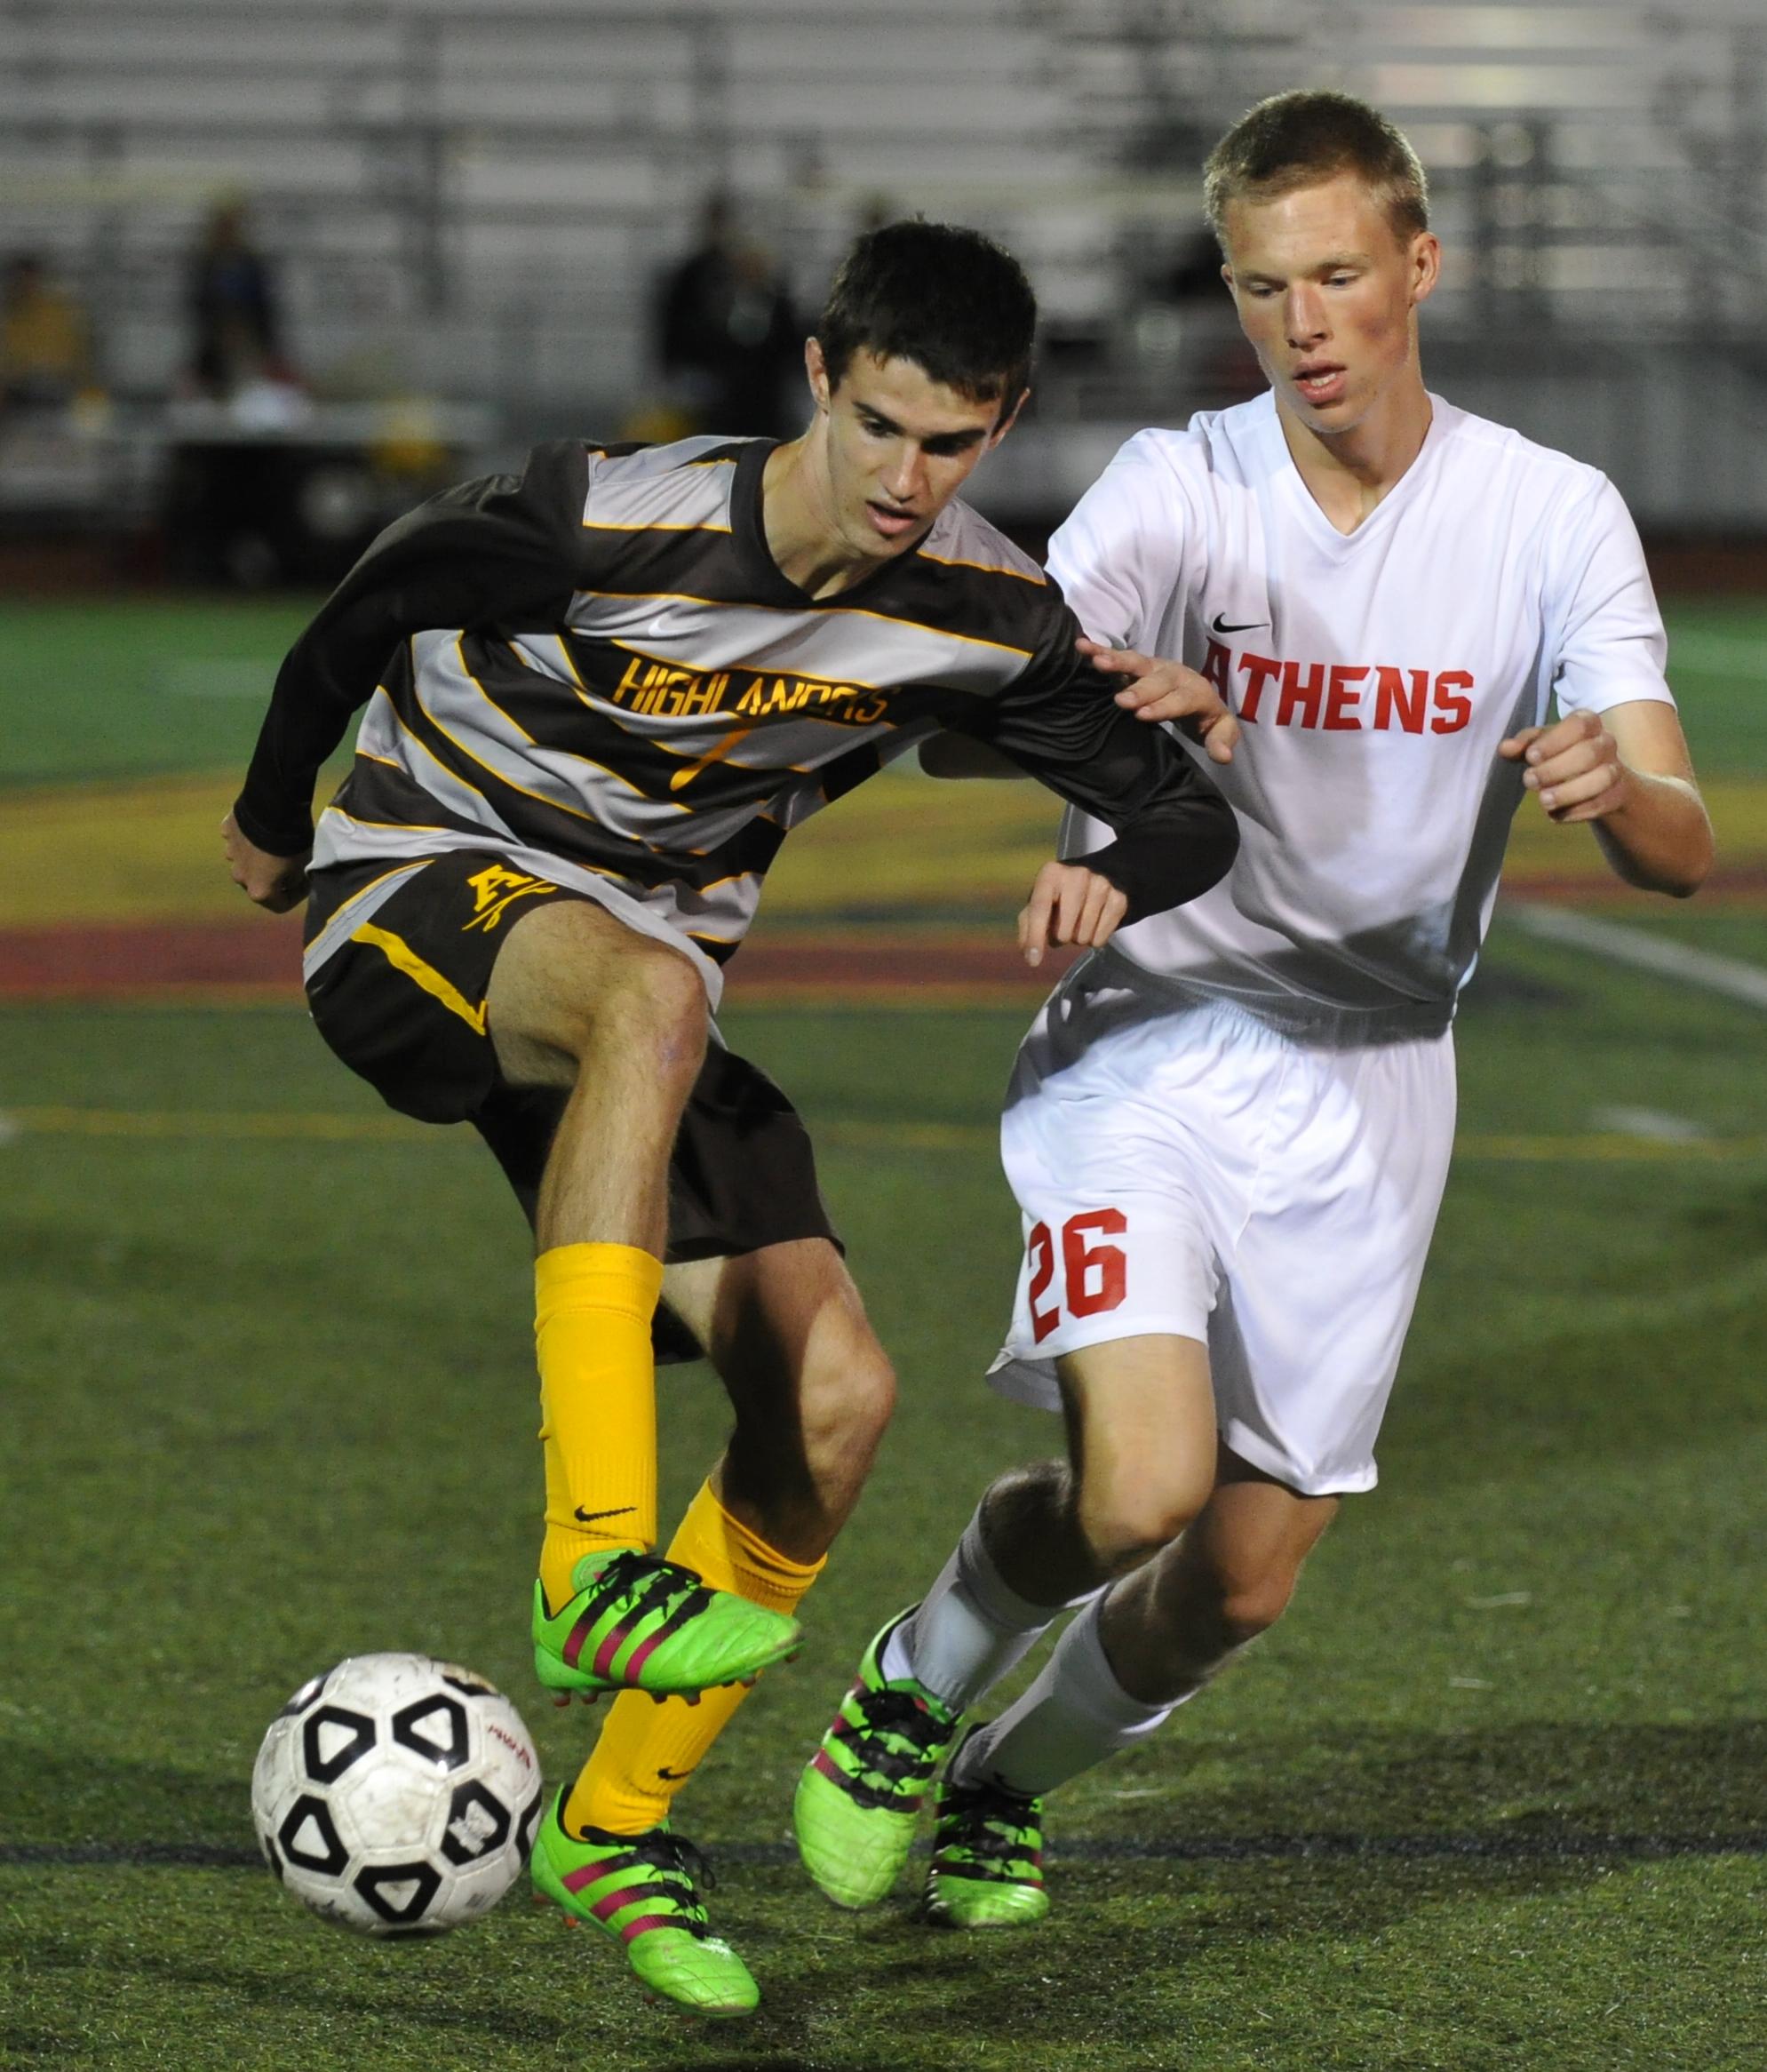 11OC16 Rochester Adams @ Troy Athens boys varsity soccer